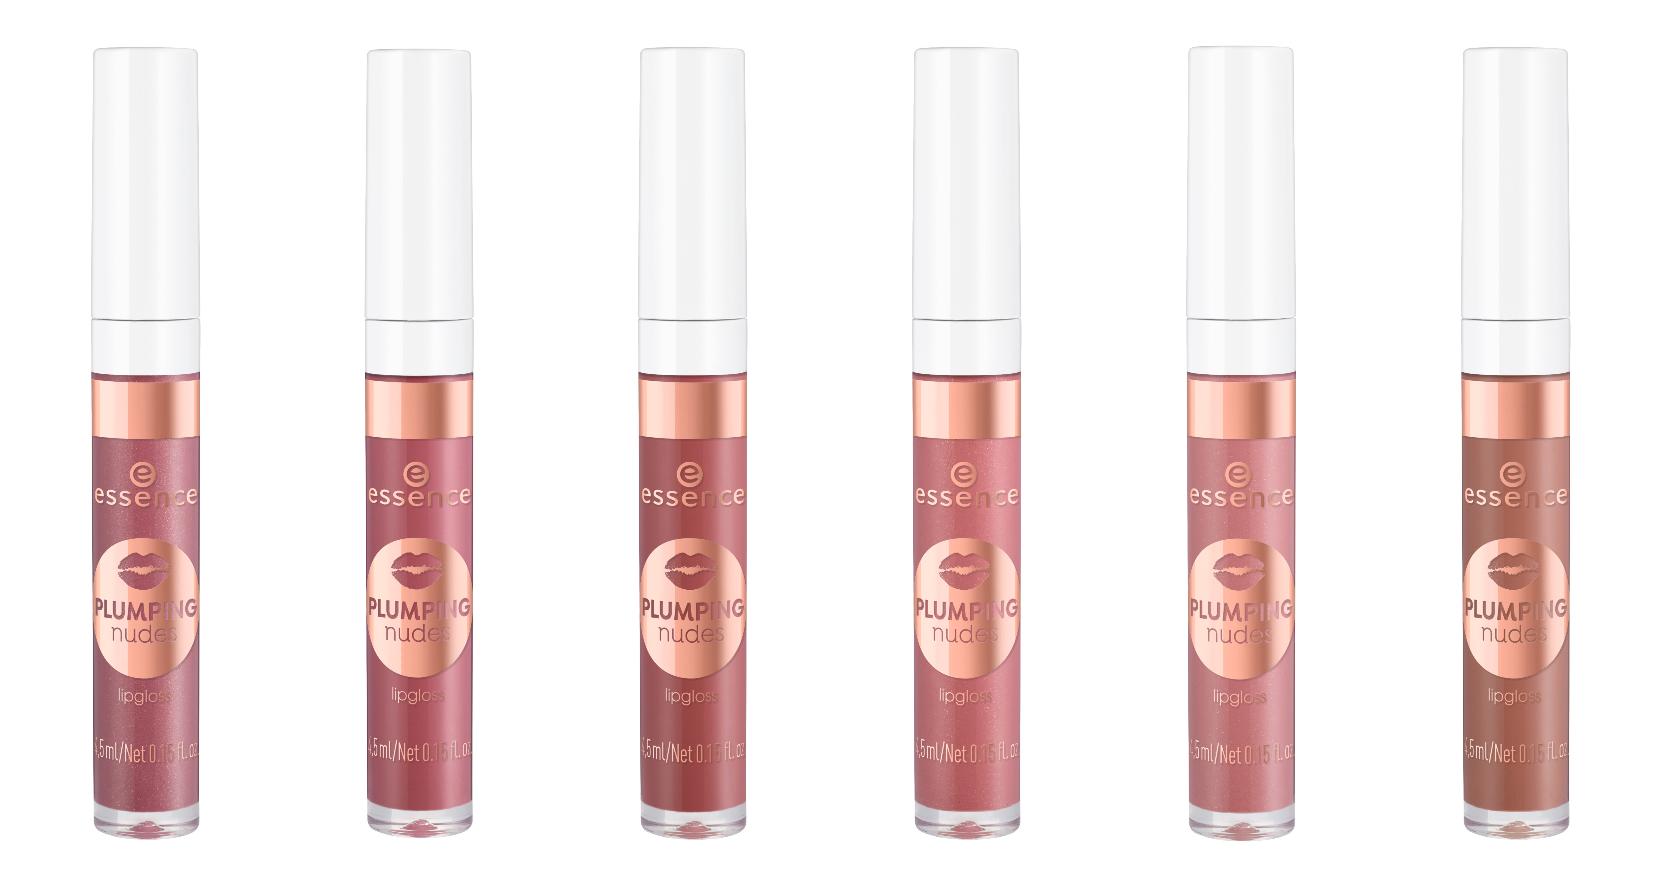 plumping nudes lipgloss